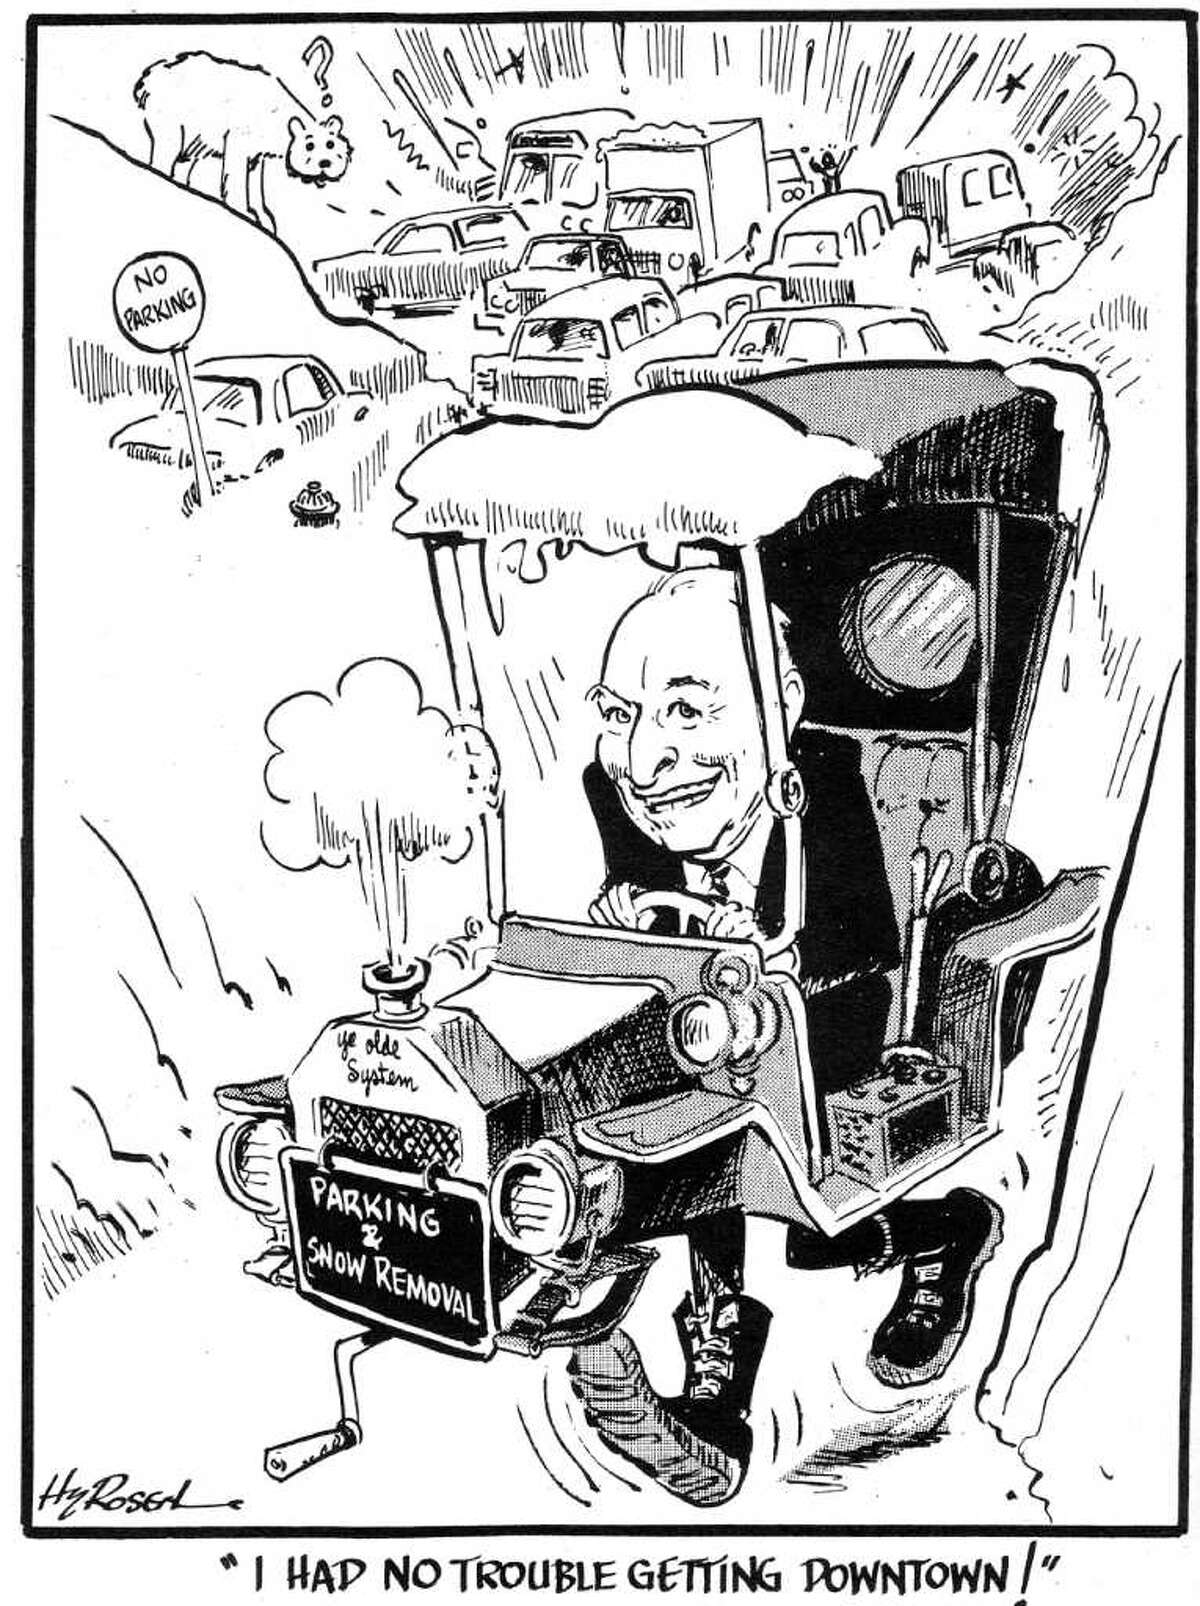 Editorial cartoon by Hy Rosen. June 1, 1983, following the death a few days earlier of Albany Mayor Erastus Corning 2nd.